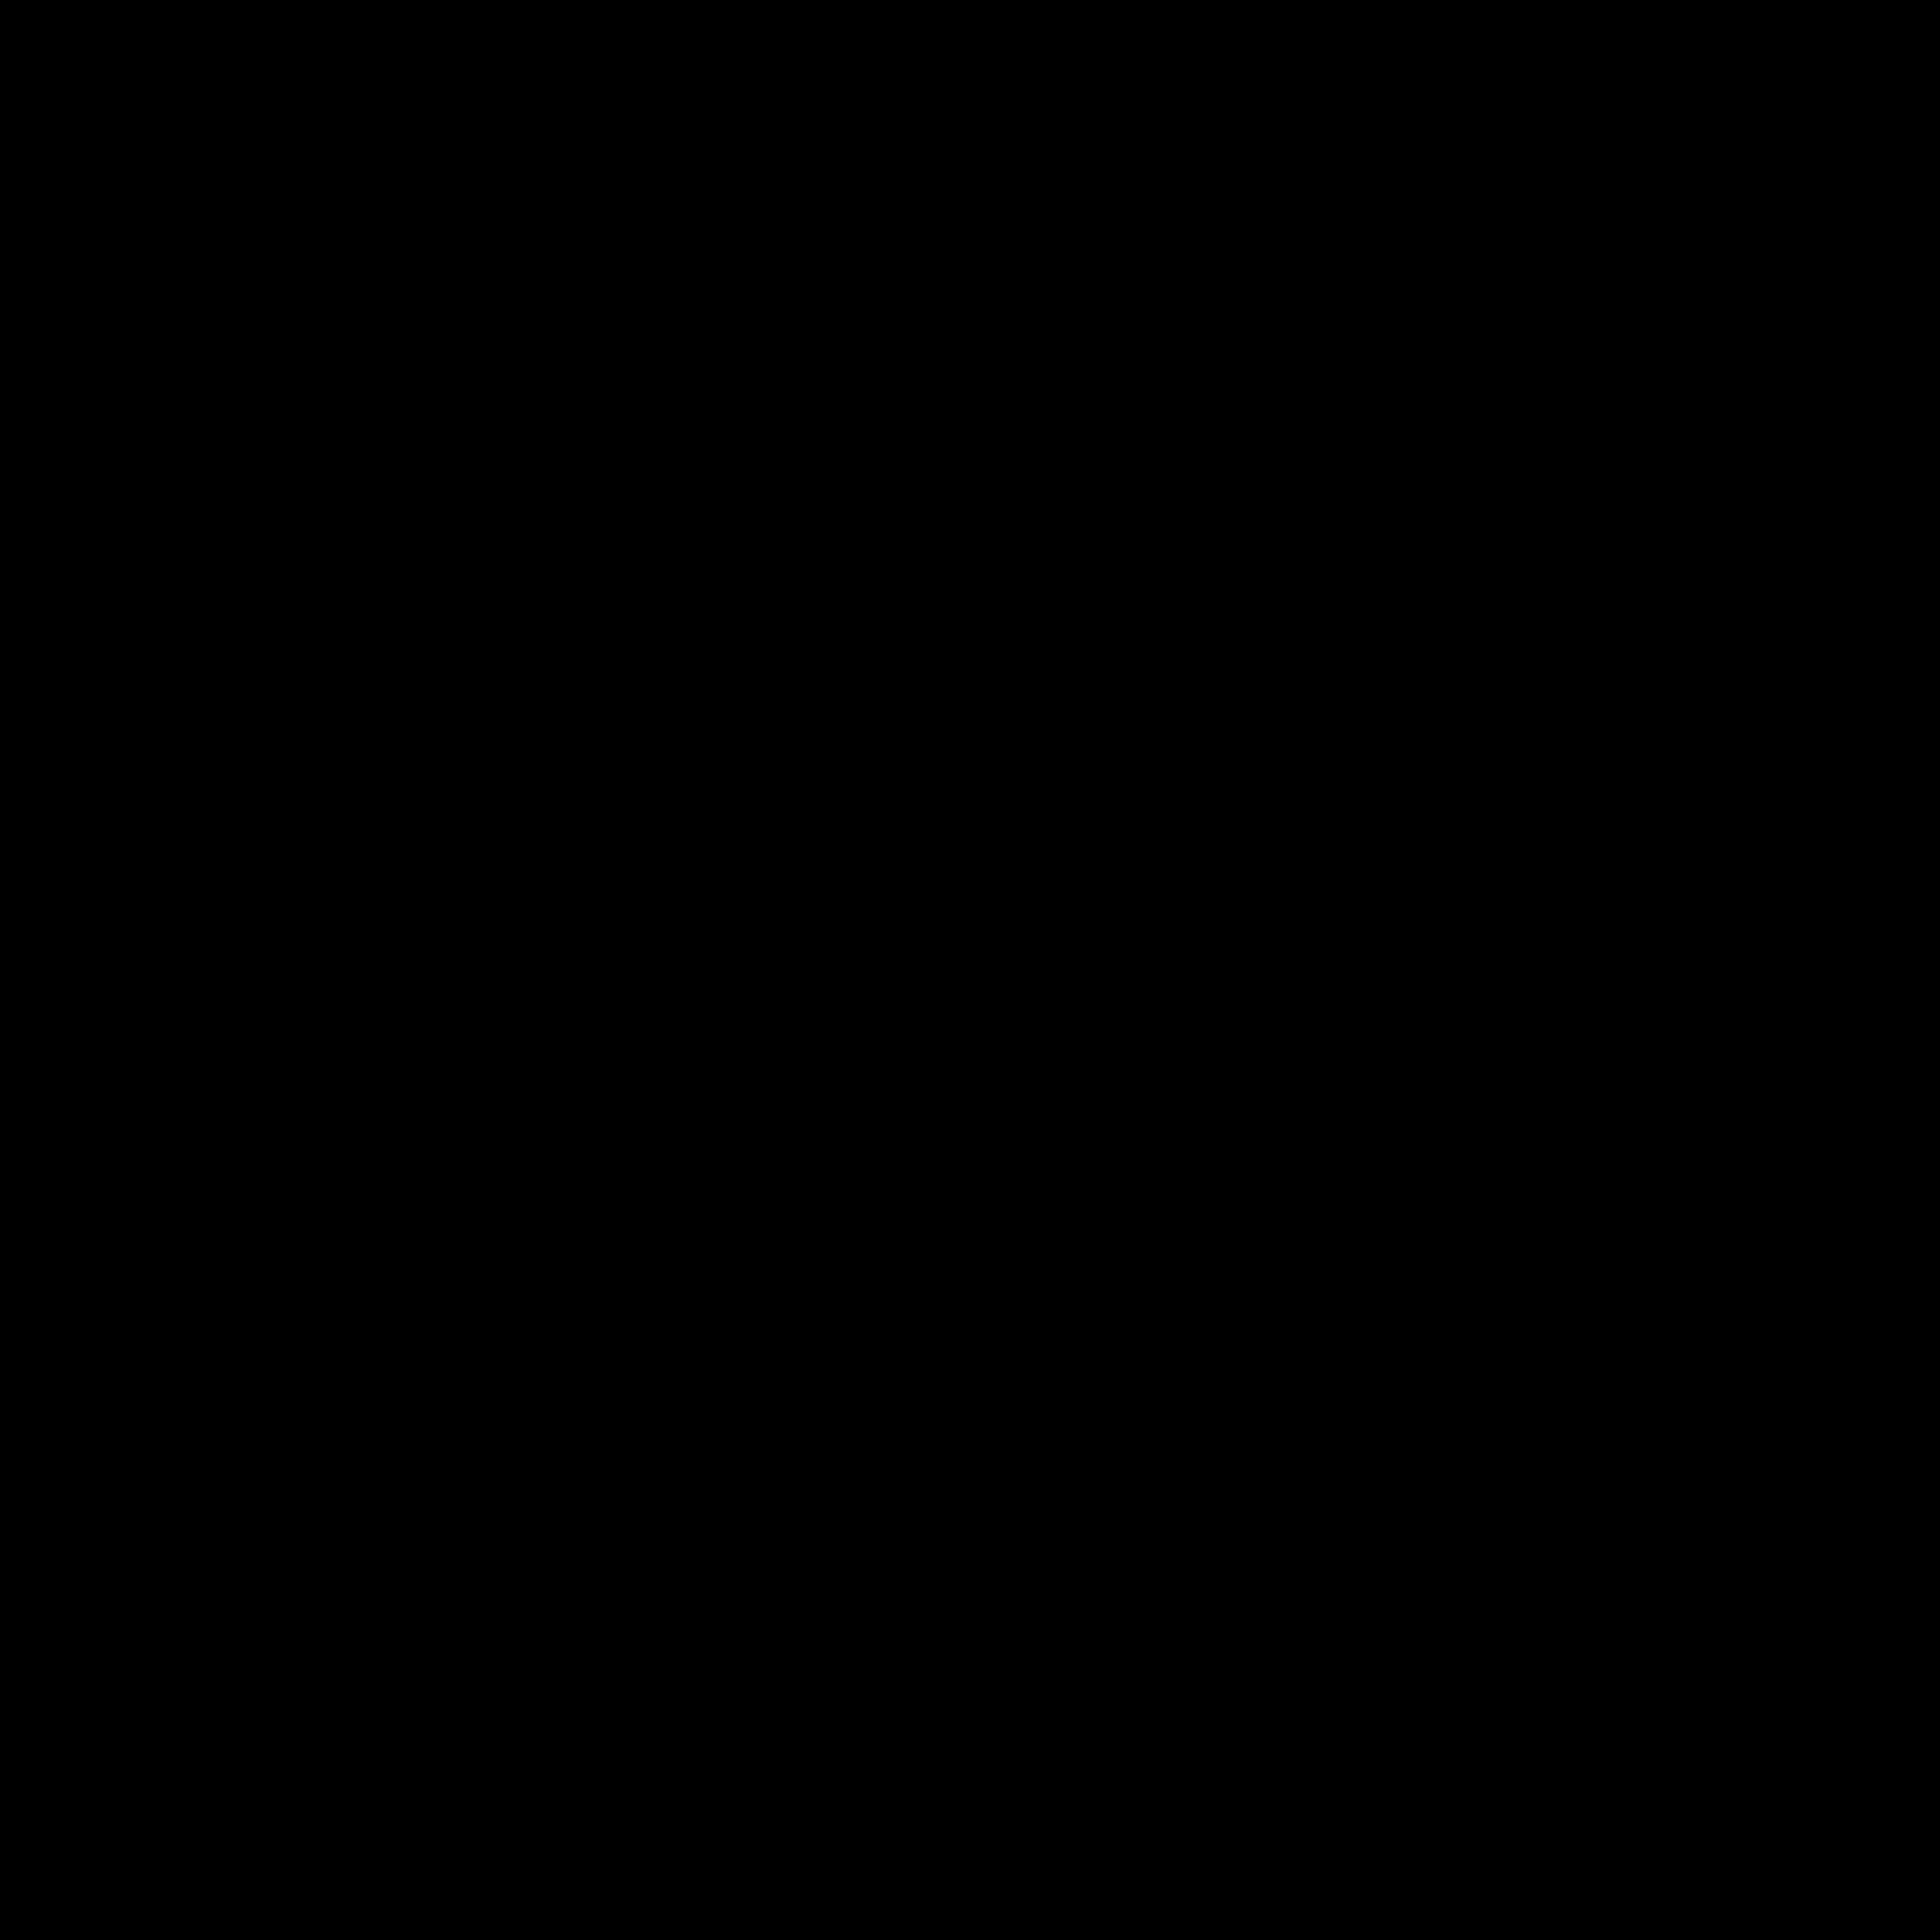 optimum nutrition logo 0 - Optimum Nutrition Logo